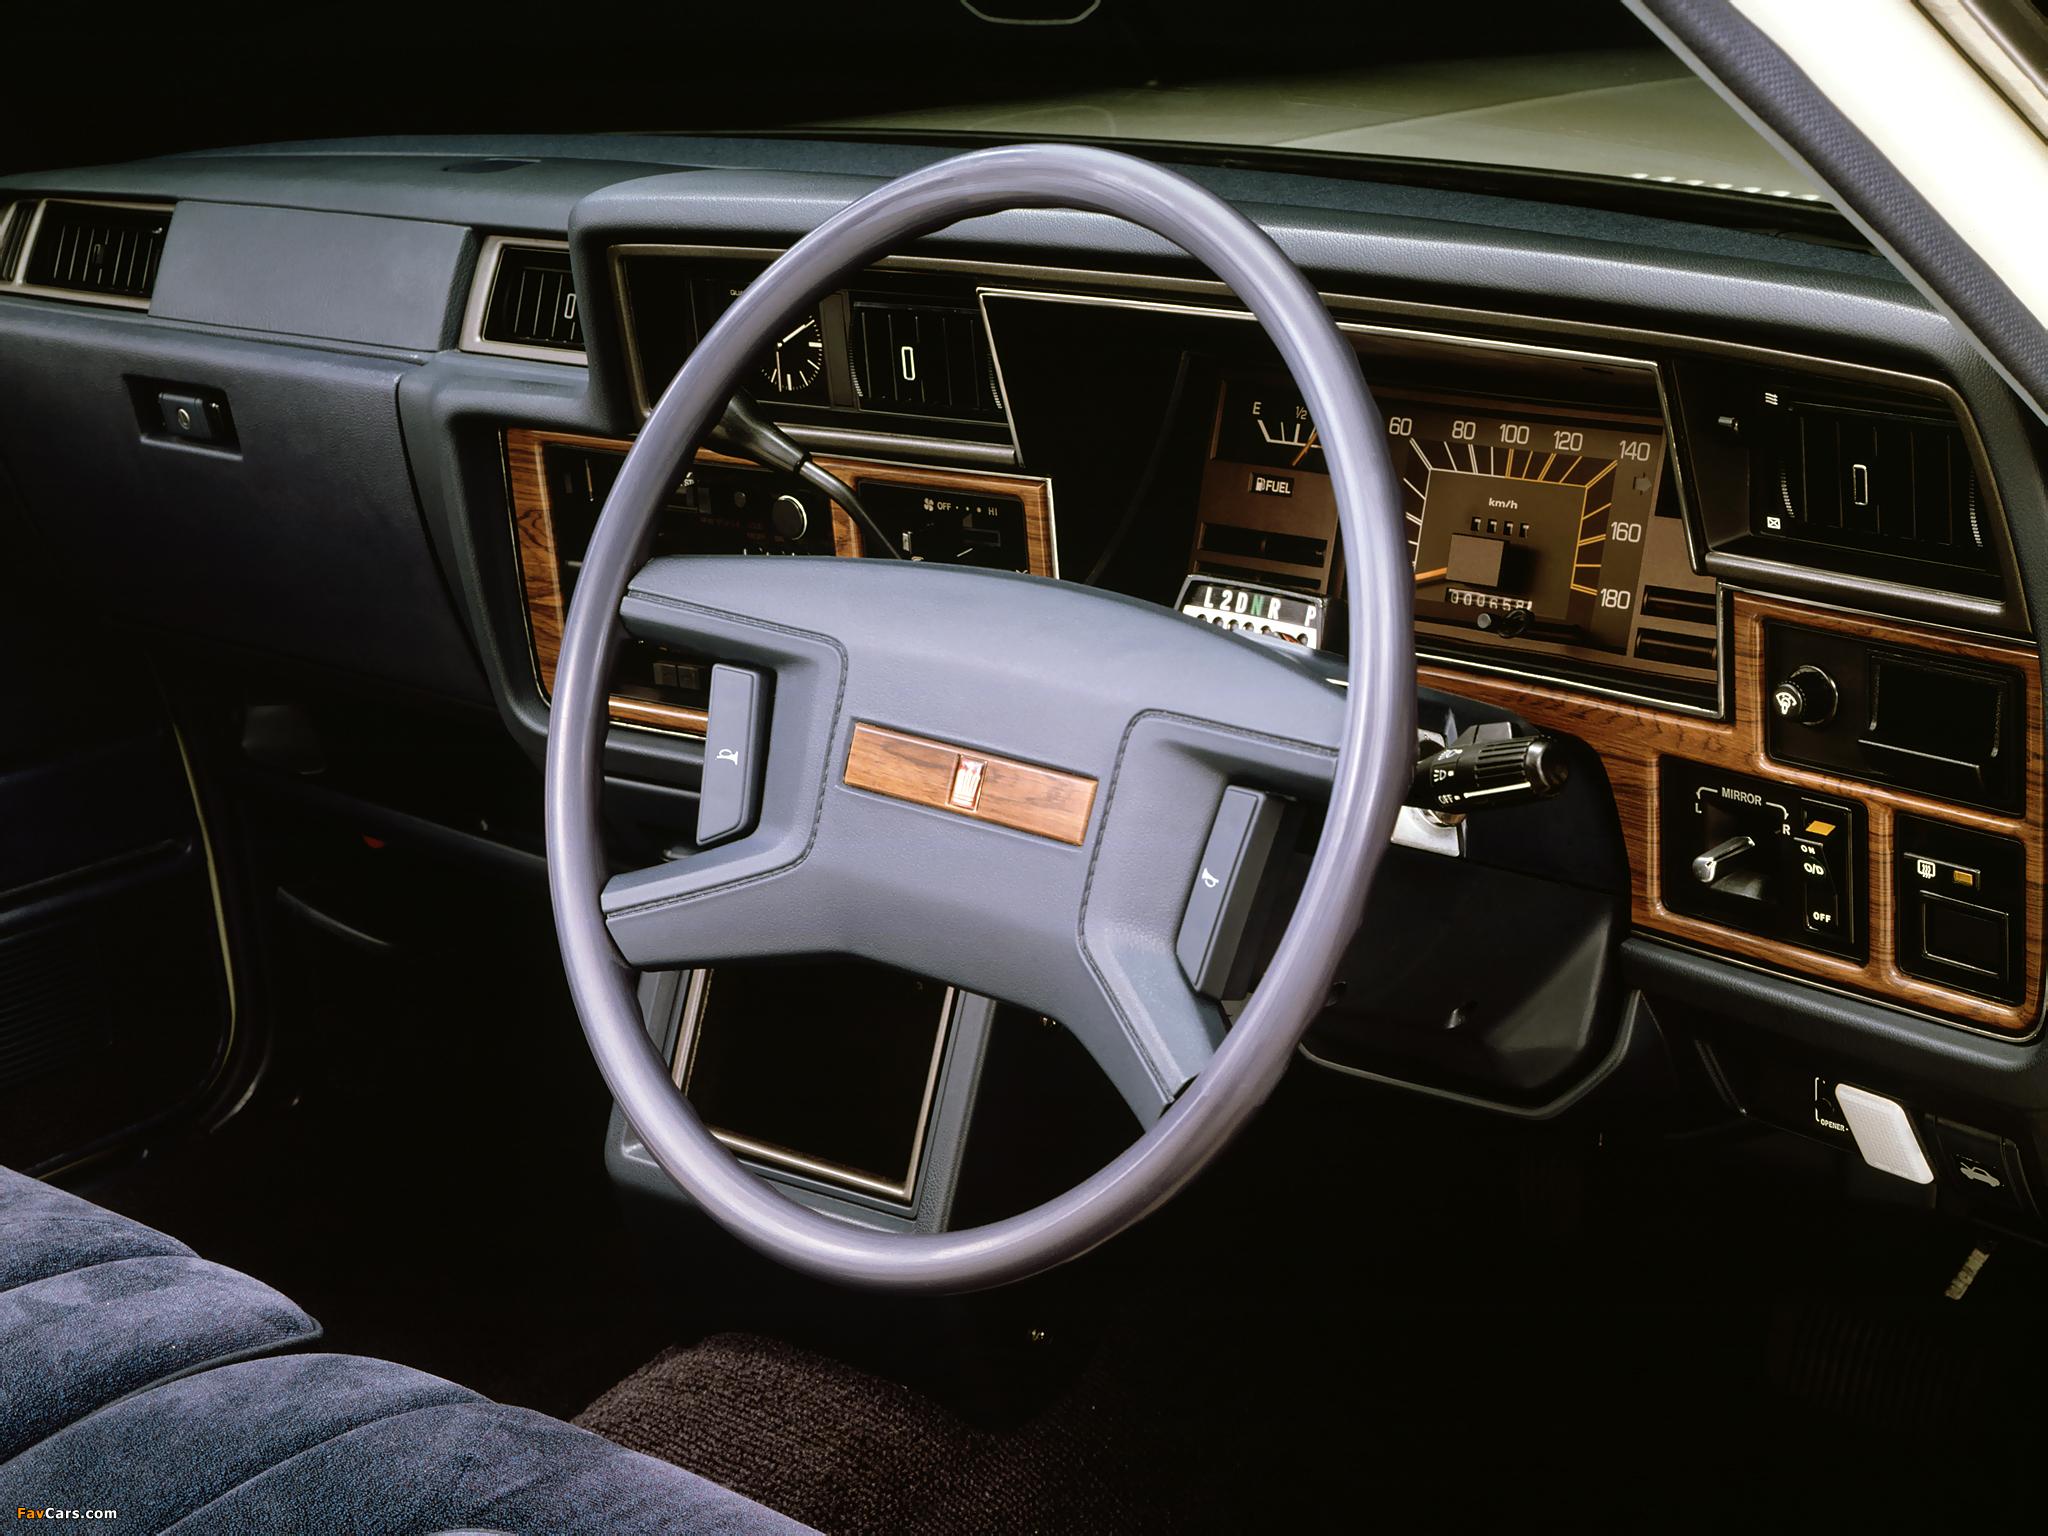 Toyota Crown Super Saloon Sedan S110 1979 83 Pictures